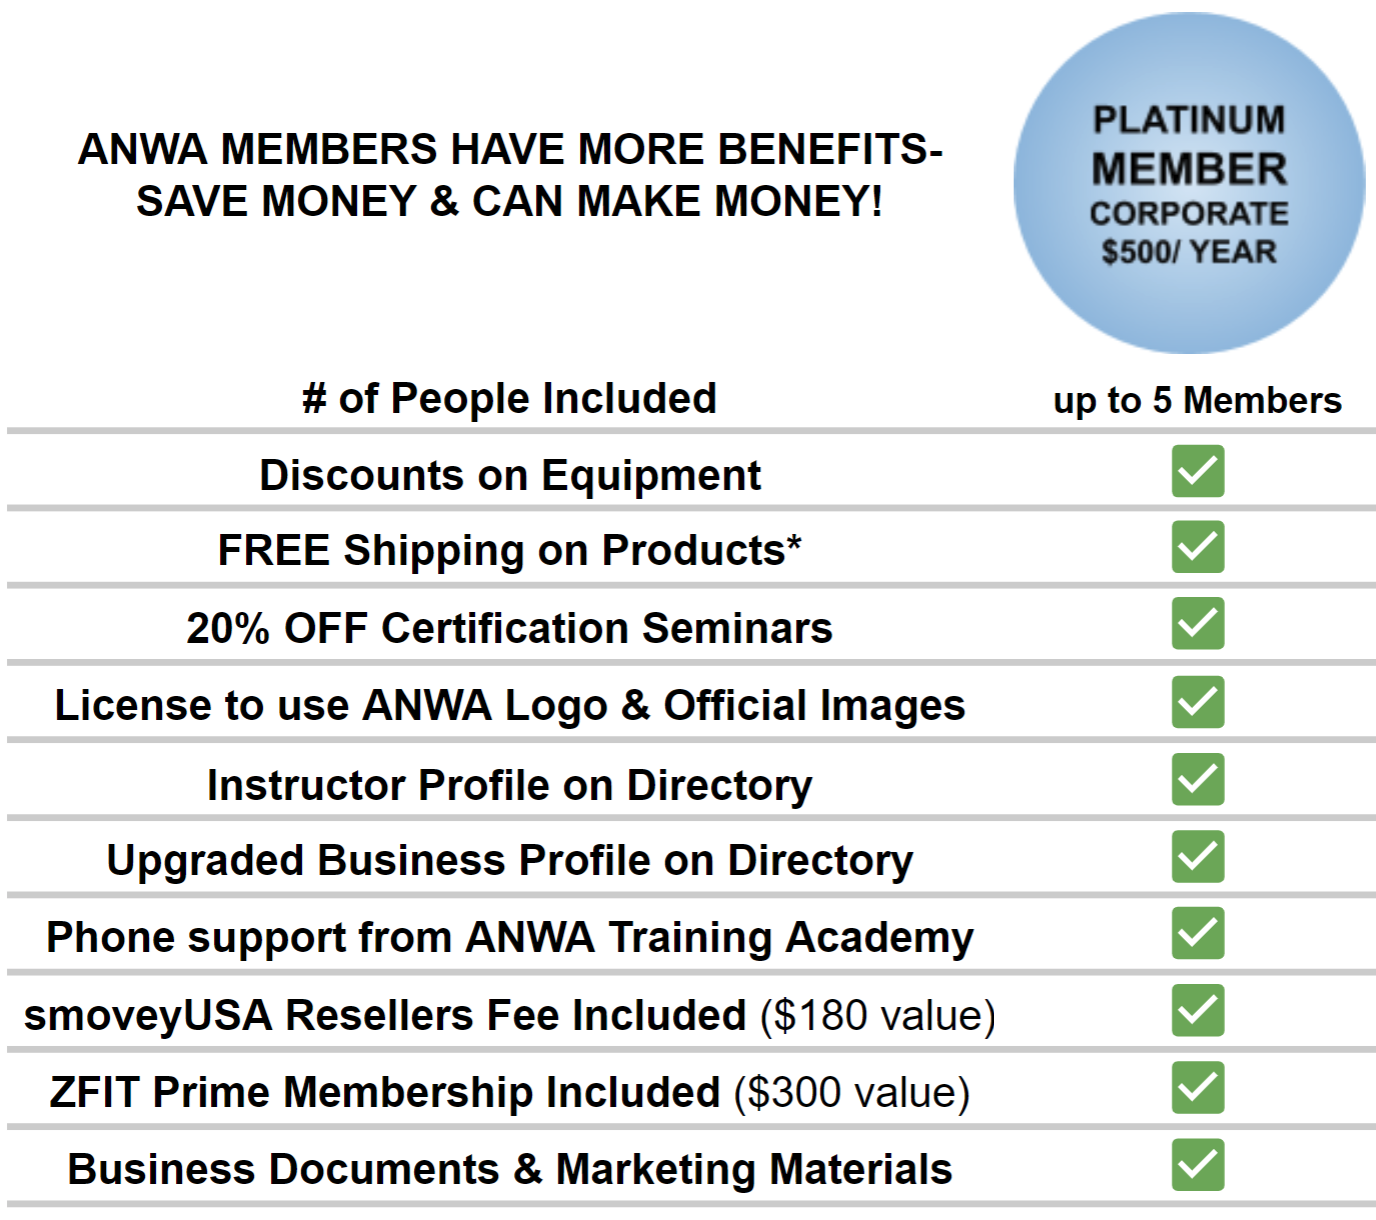 Nordic Walking Online Business Membership Package- Corporate Platinum